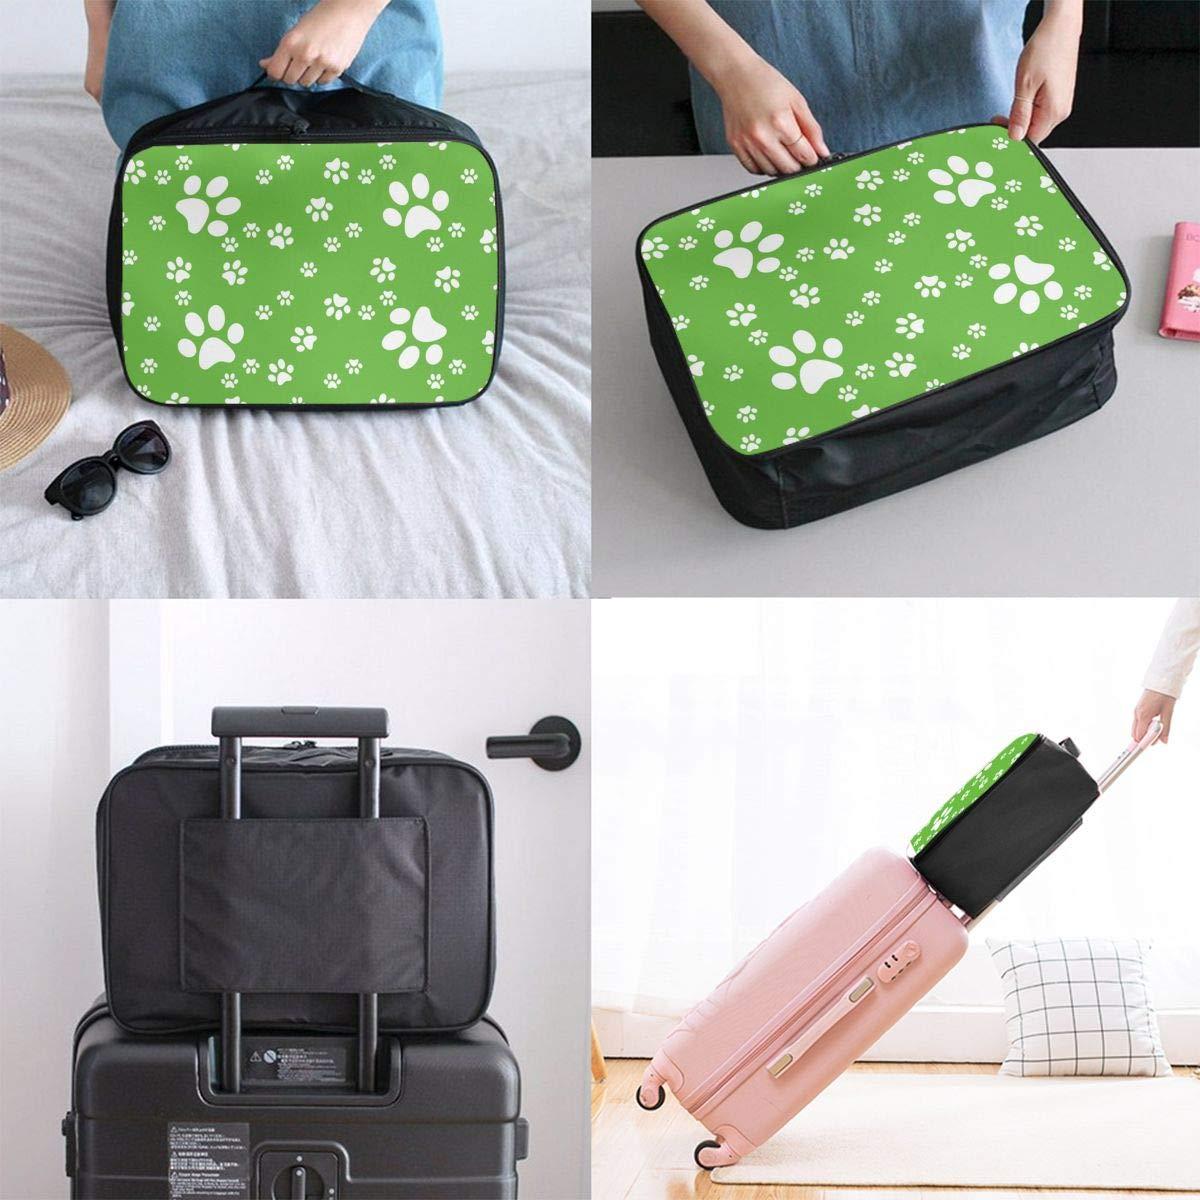 ADGAI Paws Seamless Paws Pattern Background Canvas Travel Weekender Bag,Fashion Custom Lightweight Large Capacity Portable Luggage Bag,Suitcase Trolley Bag